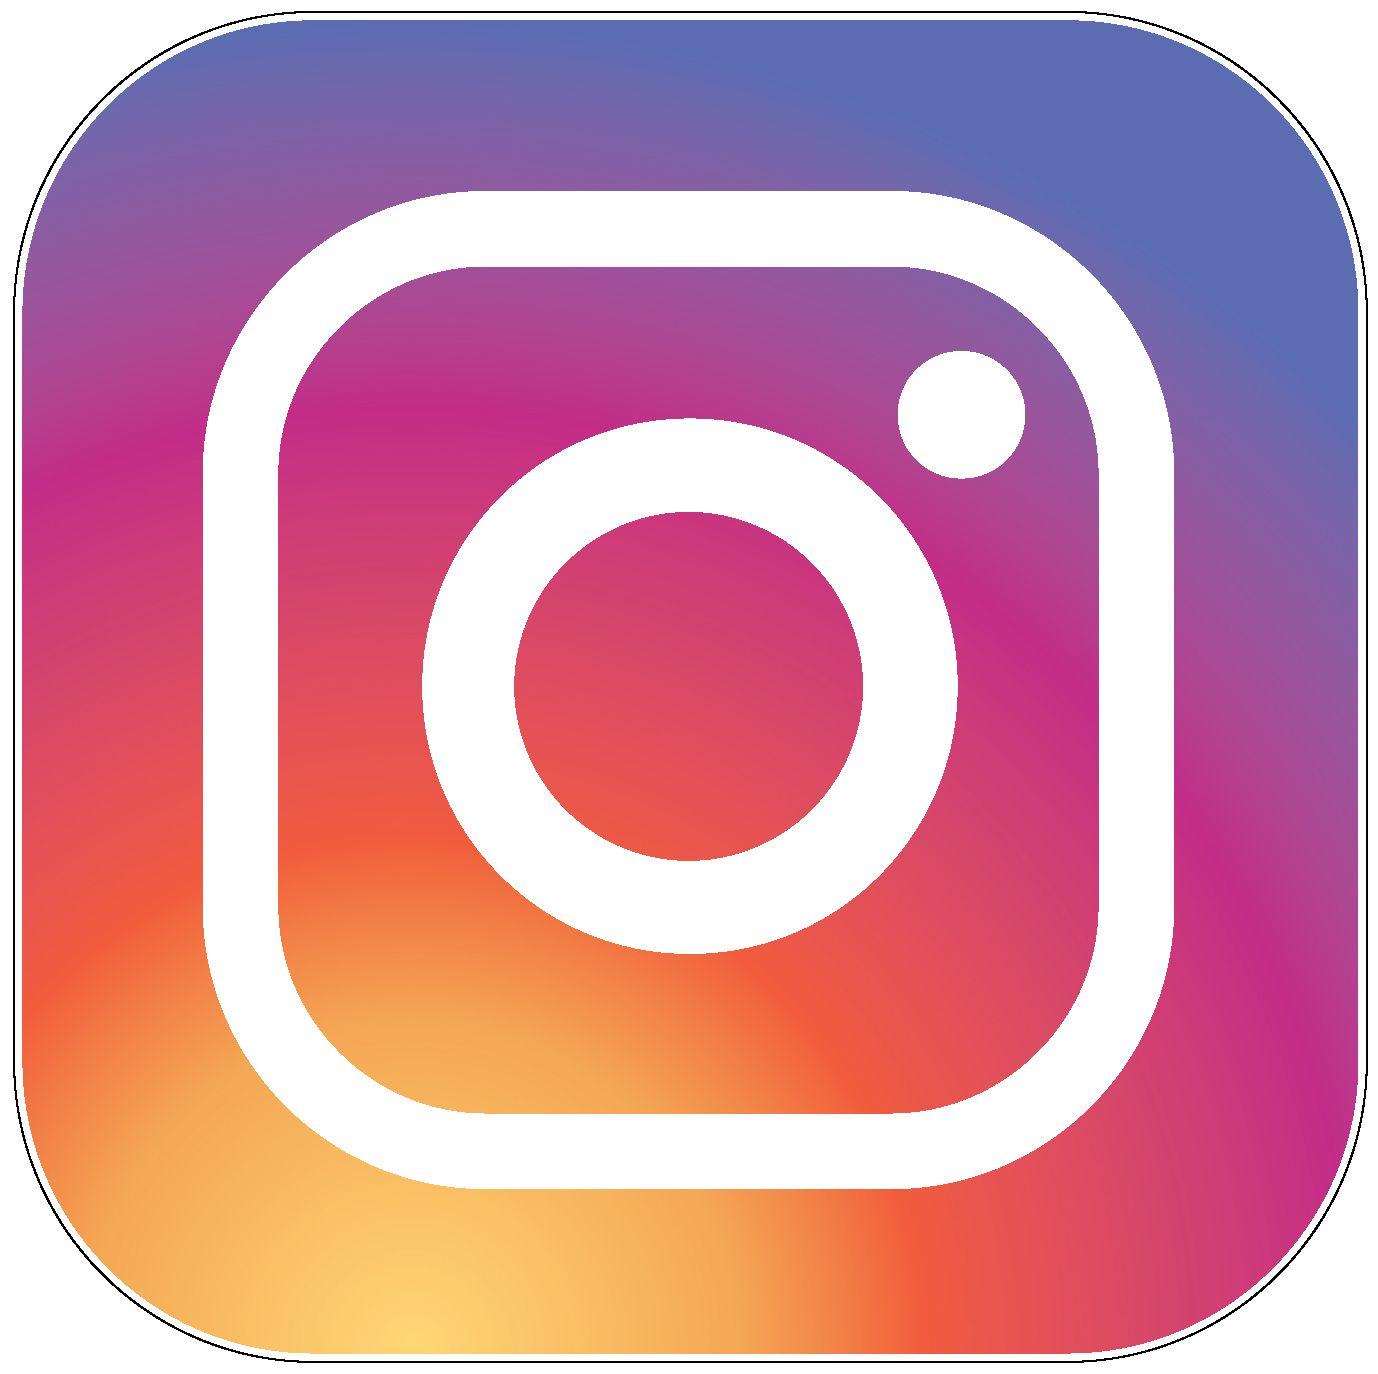 New Instagram Logo Vinyl Sticker (printed vinyl decal.